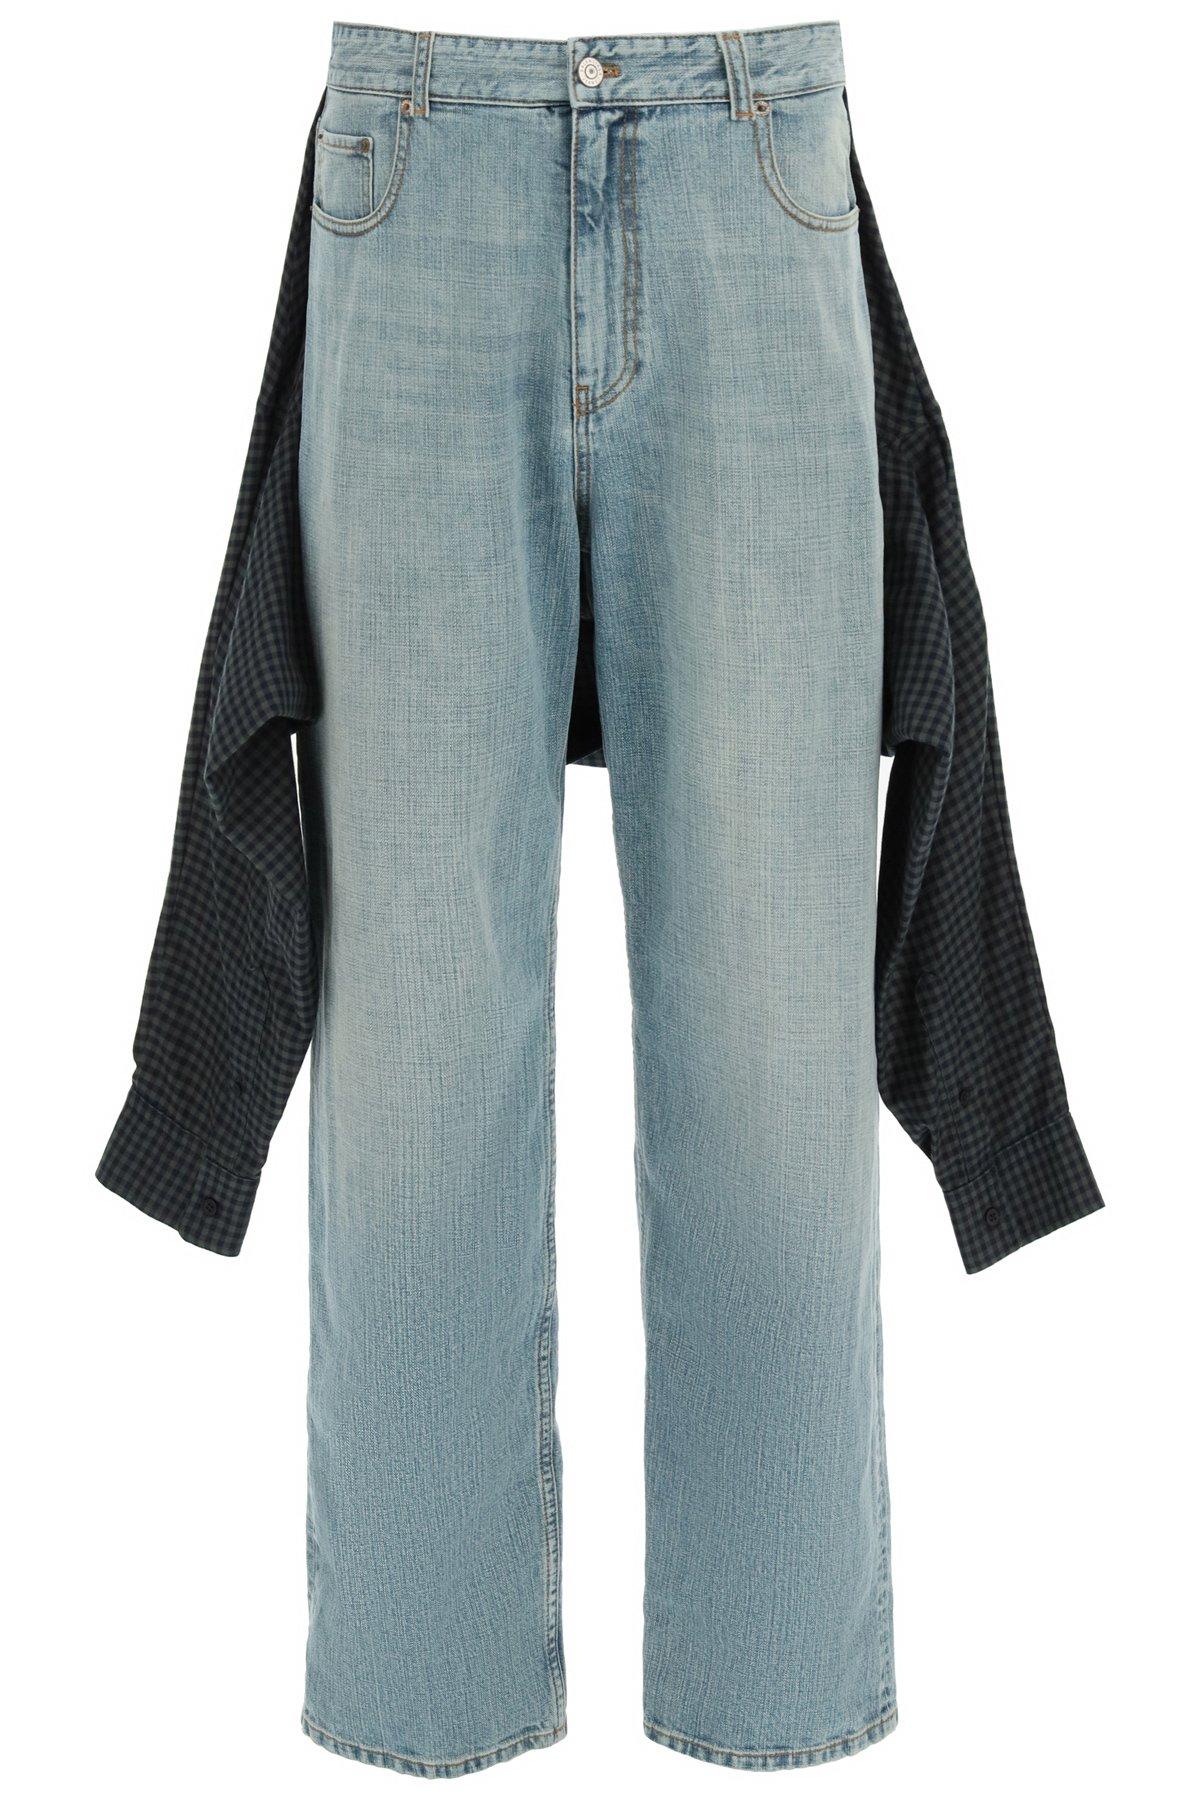 Balenciaga jeans hibrid shirt